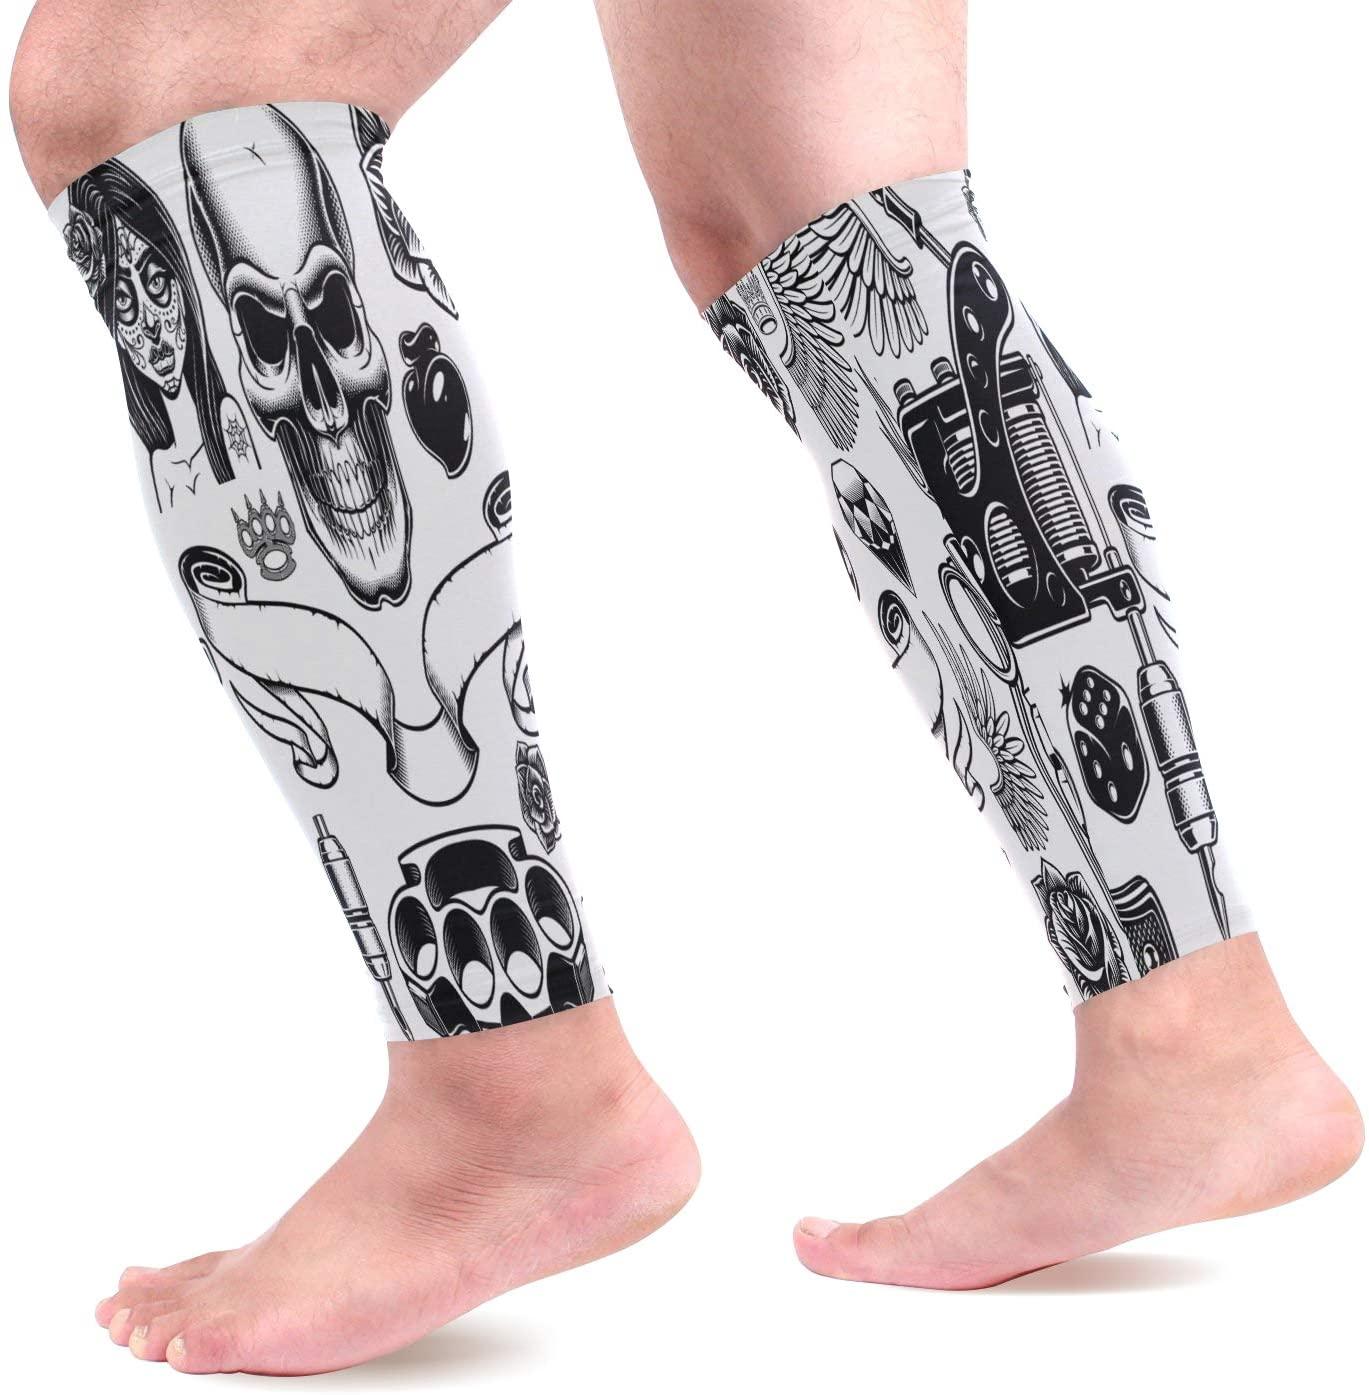 Calf Compression Sleeves Tattoo Art Leg Compression Socks for Runners, Shin Splint, Varicose Vein & Calf Pain Relief - Calf Guard for Running, Cycling, Maternity, Travel, Nurses Women